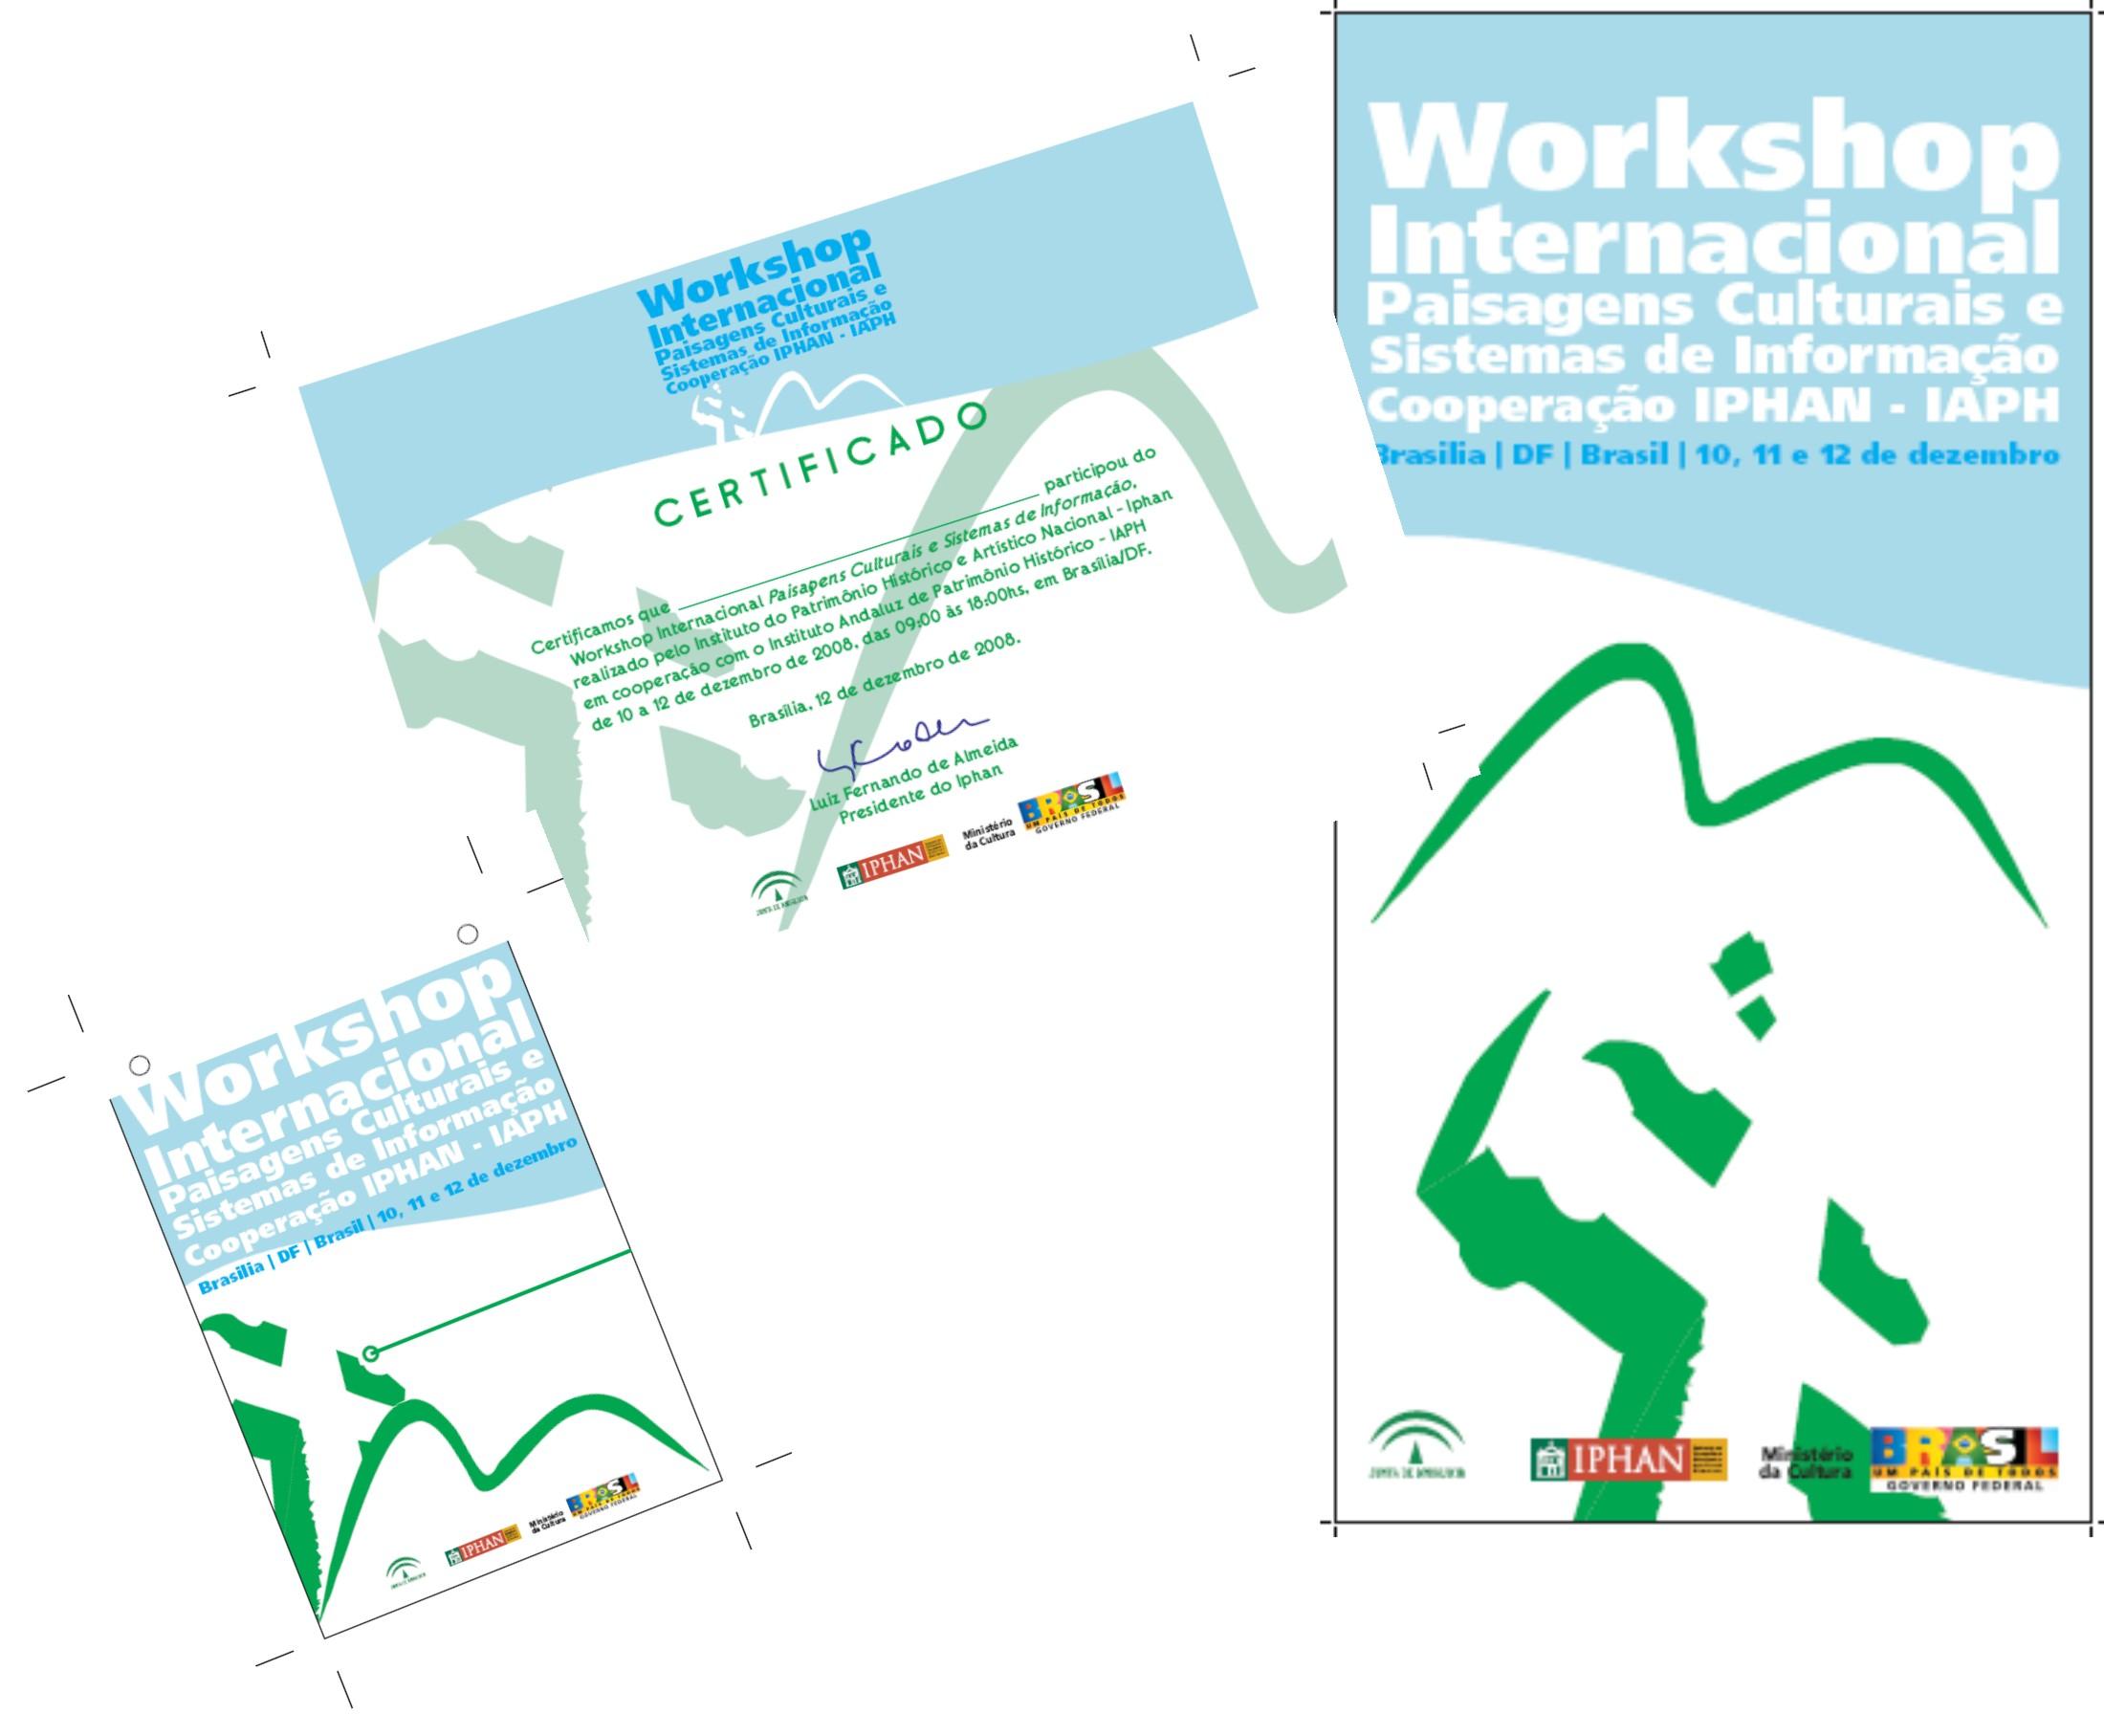 Workshop Internacional Paisagens Culturais